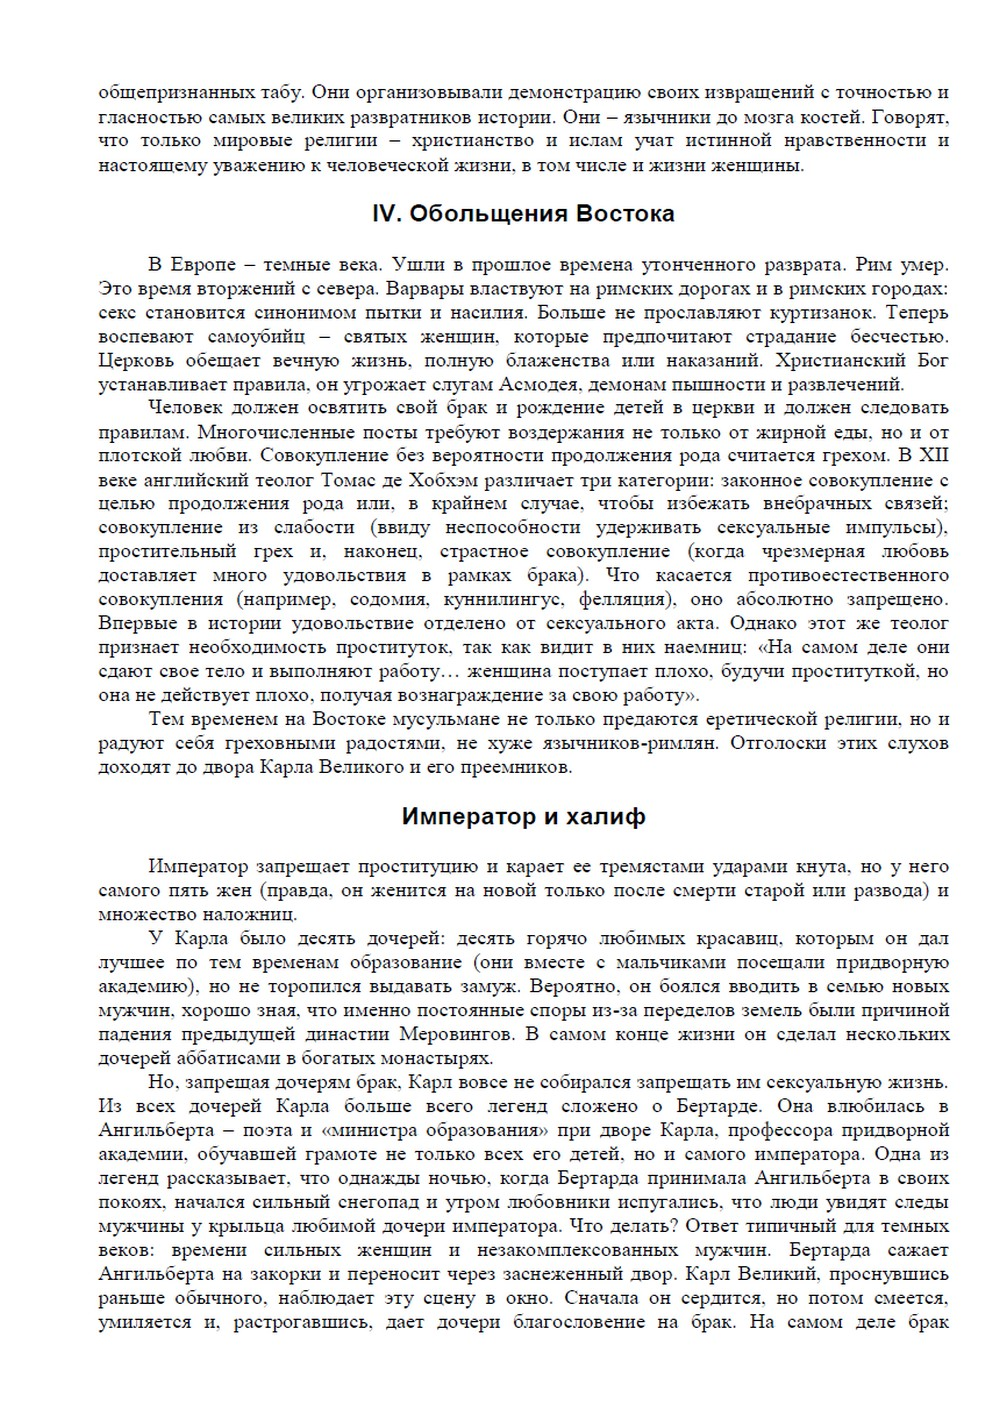 http://i2.imageban.ru/out/2013/12/04/587ed638b2abec3f6d71a53f675f3110.jpg